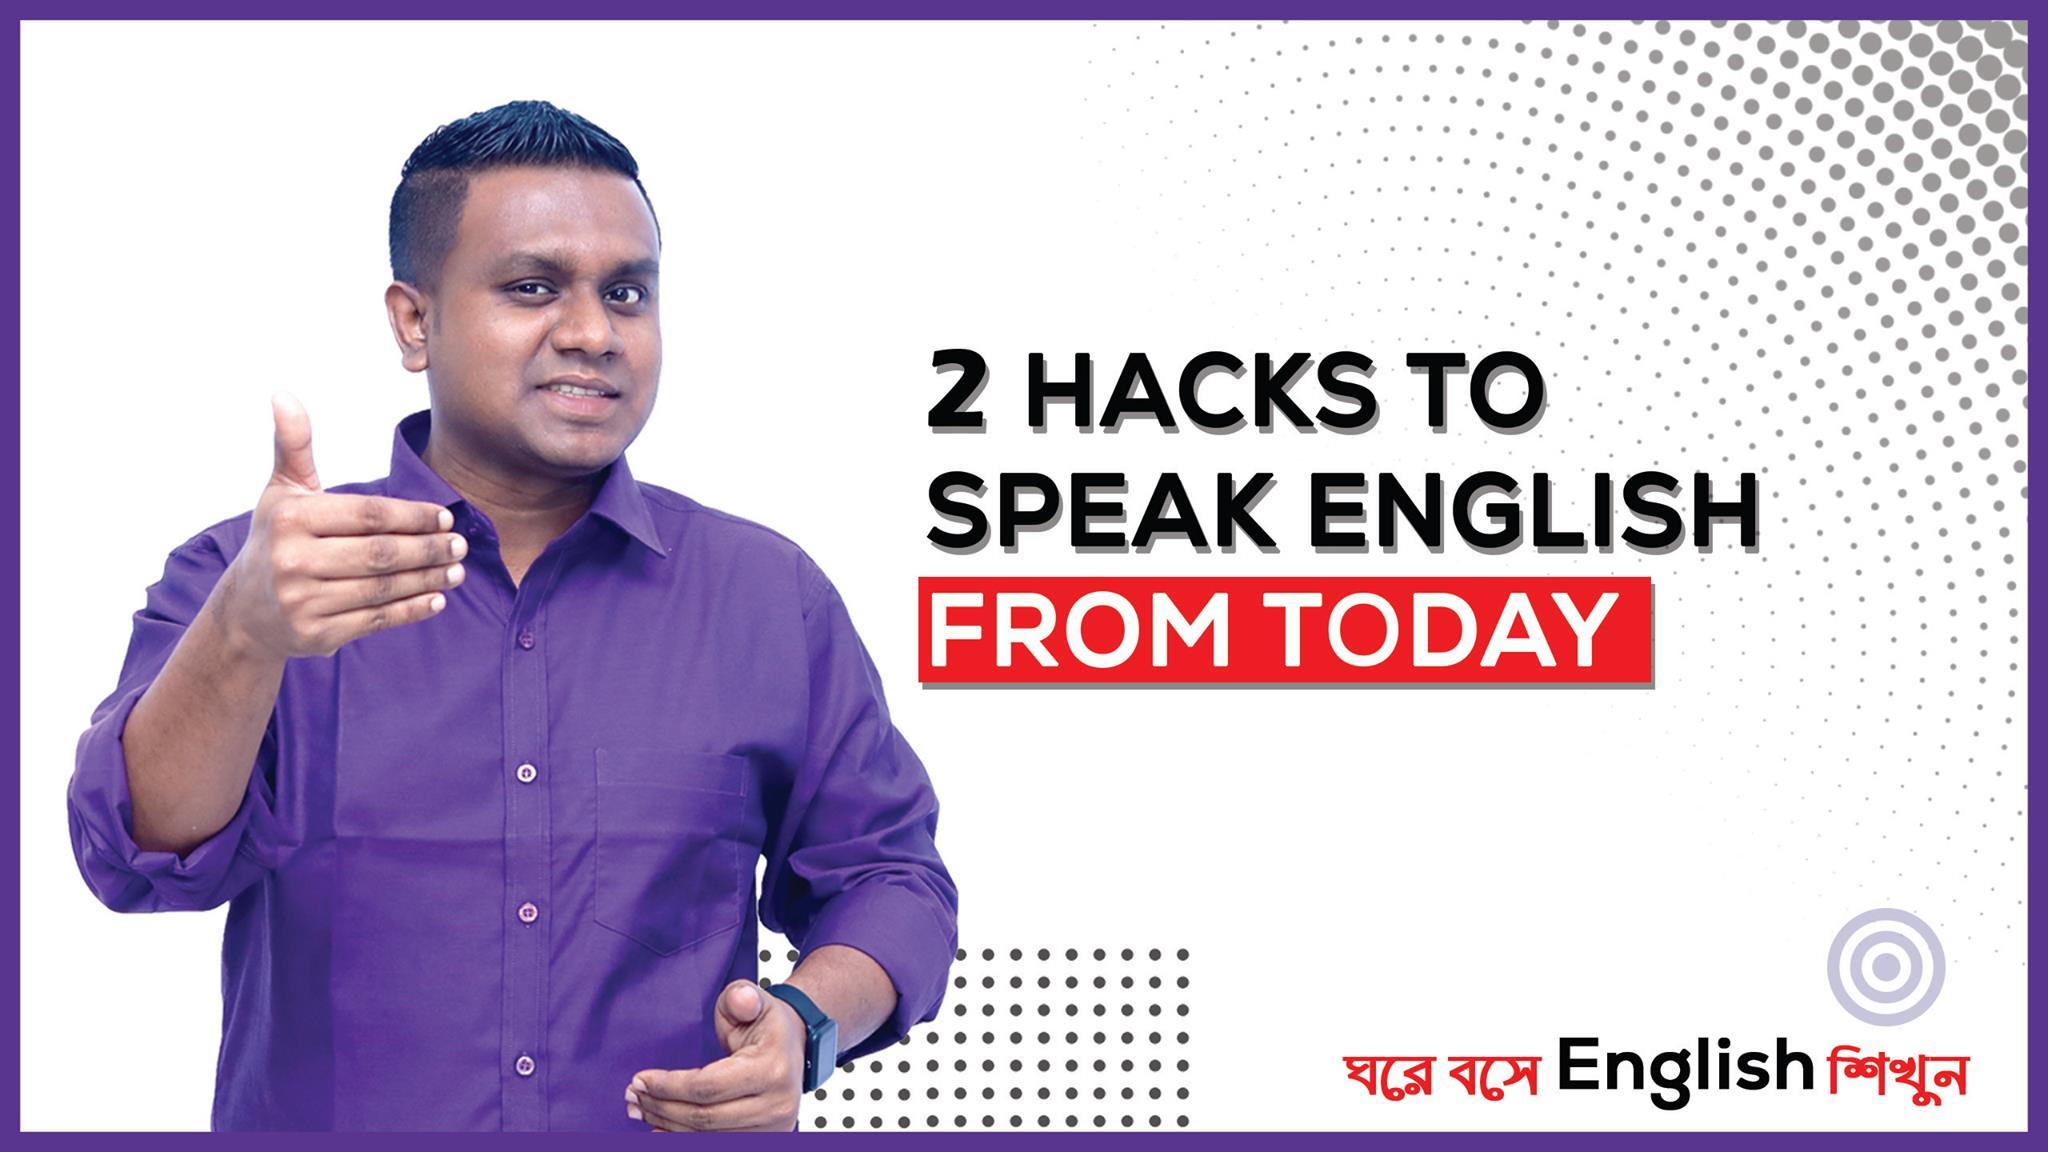 2 HACKS TO SPEAK ENGLISH FROM TODAY | ঘরে বসে ইংরেজি শিখুন